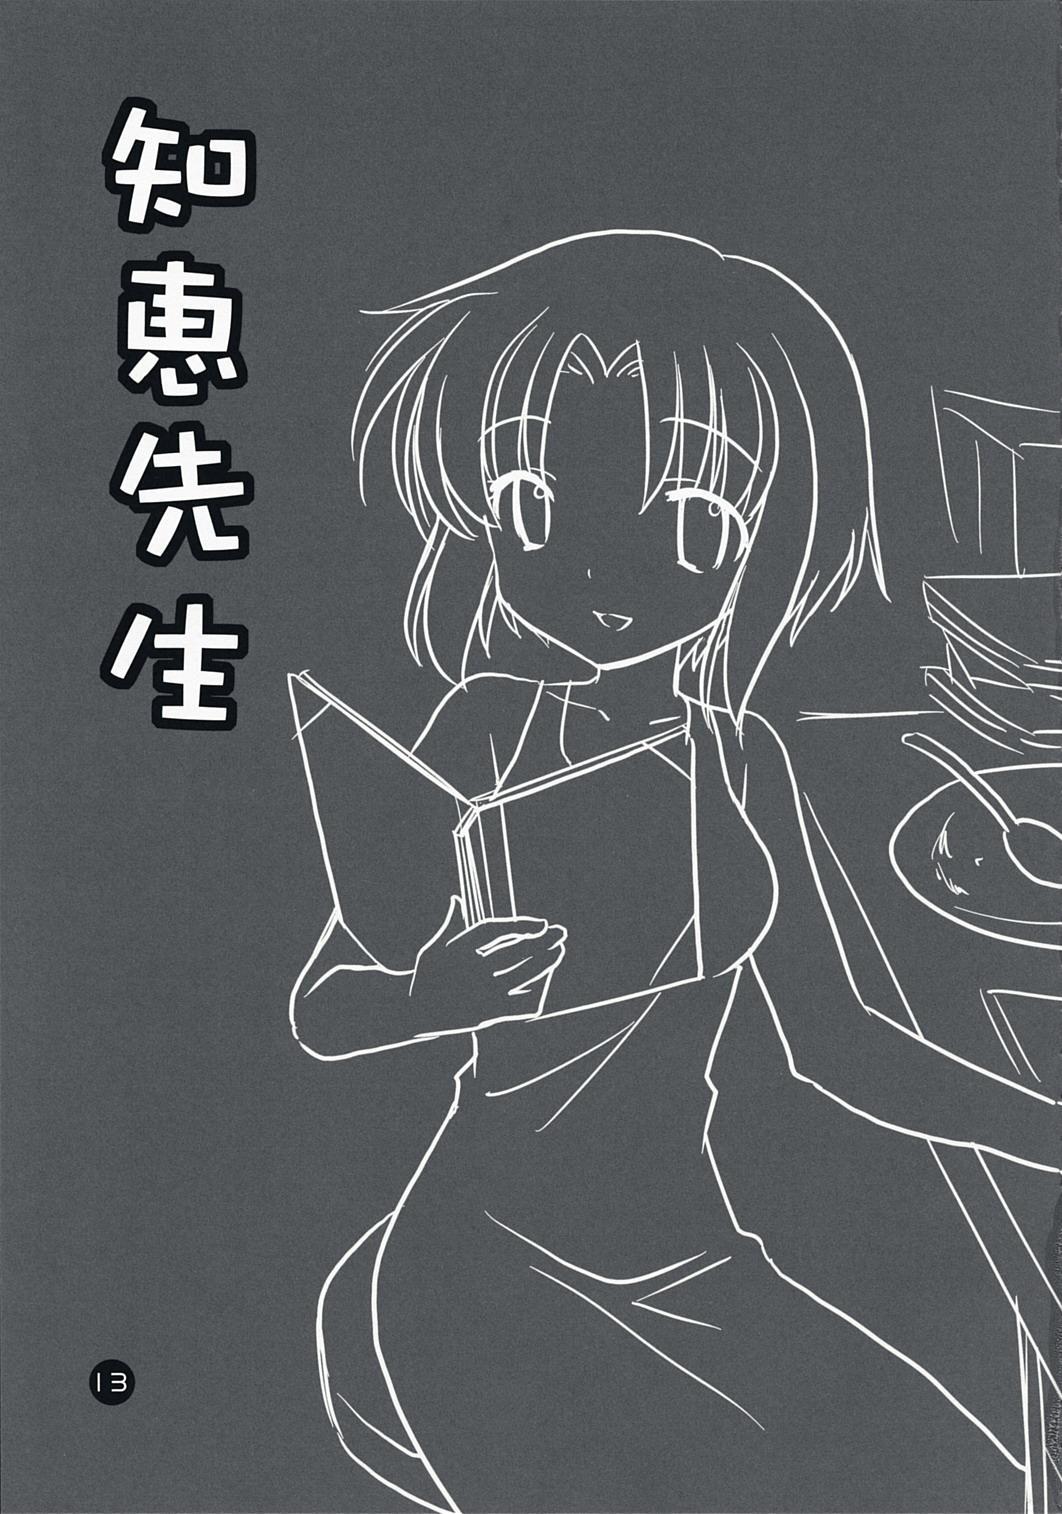 Higurashi Iroiro Bon 11